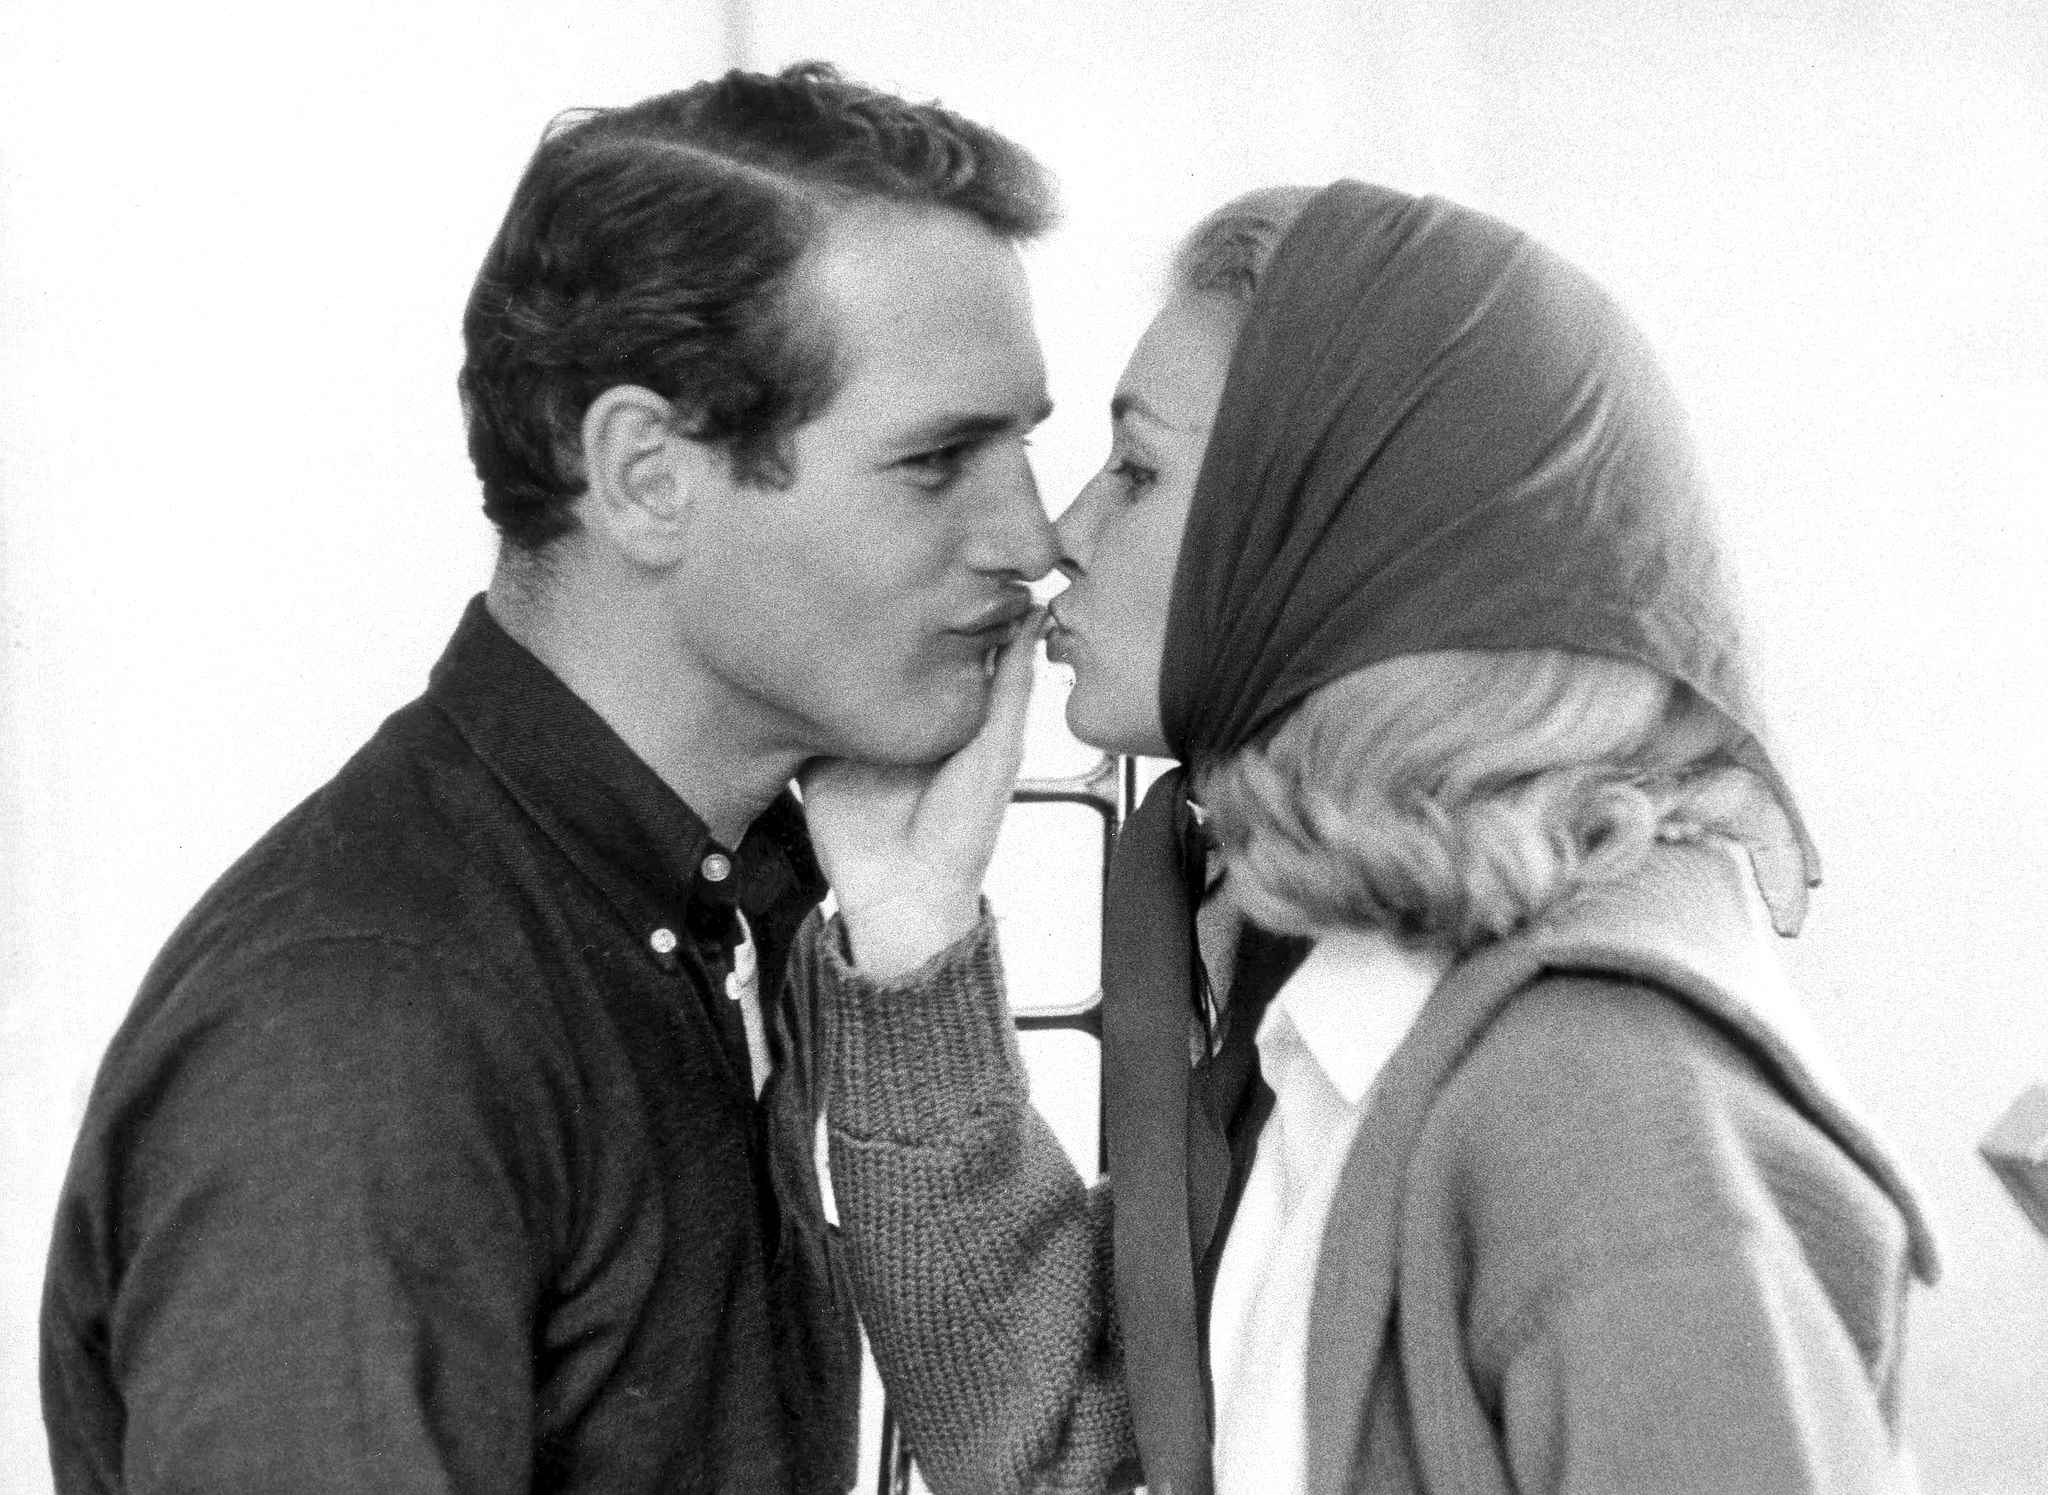 Paul Newman Wallpaper